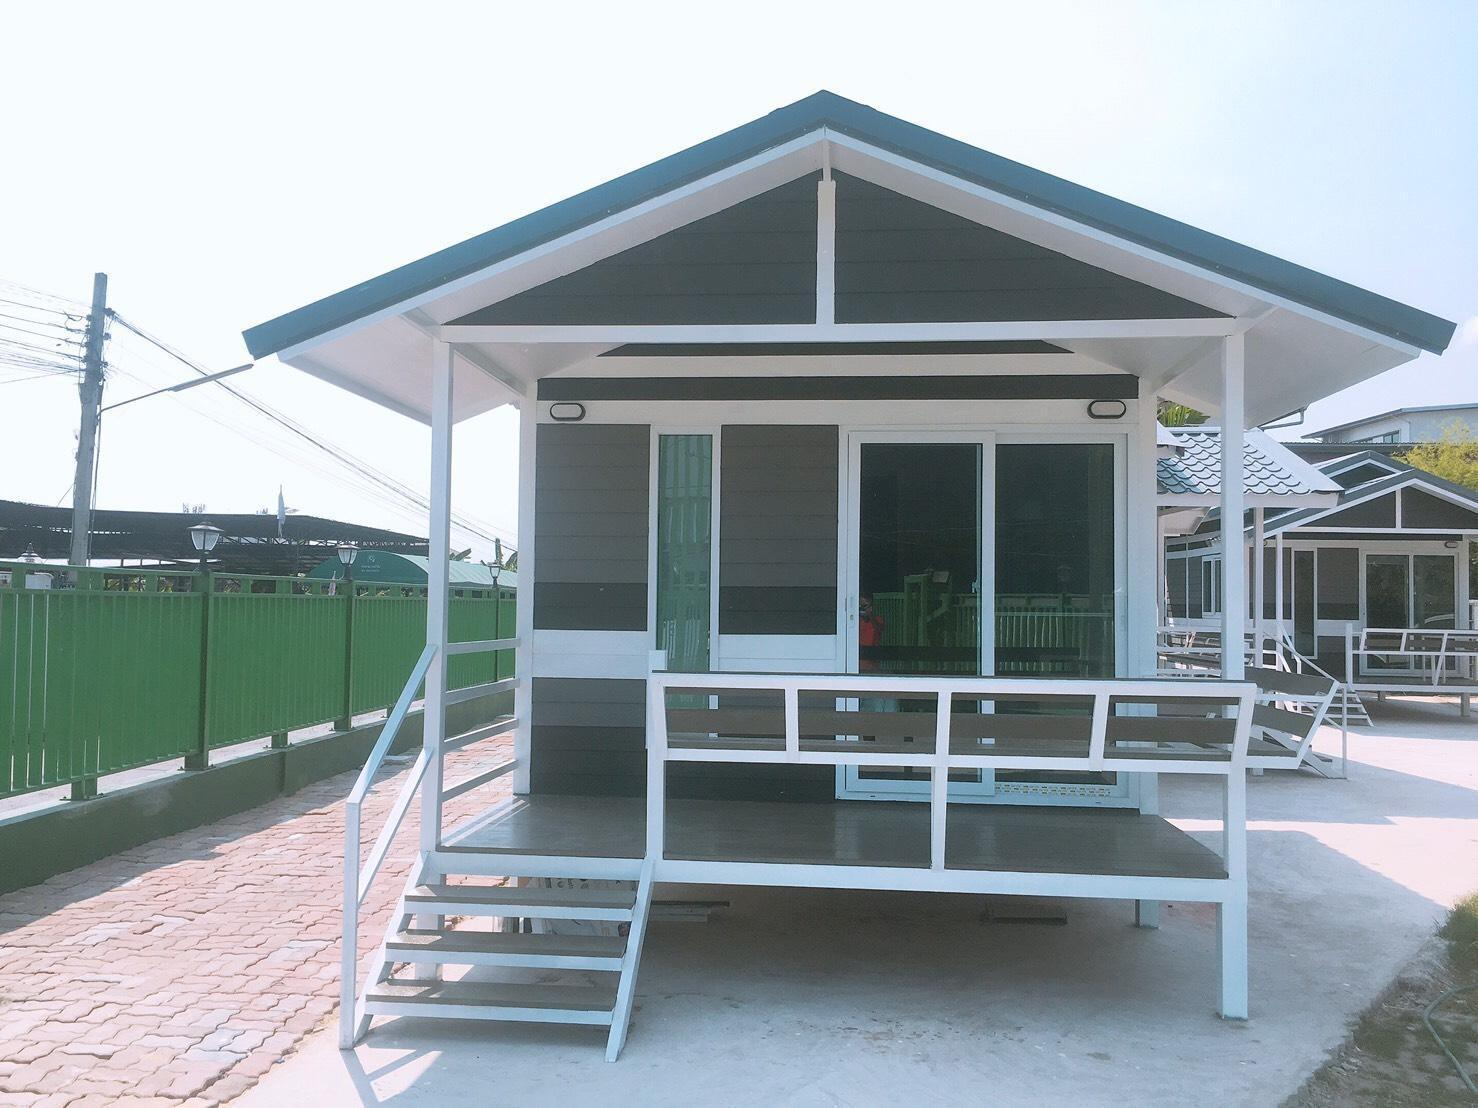 5kon@home บ้านเดี่ยว 1 ห้องนอน 1 ห้องน้ำส่วนตัว ขนาด 21 ตร.ม. – Don Mueang International A